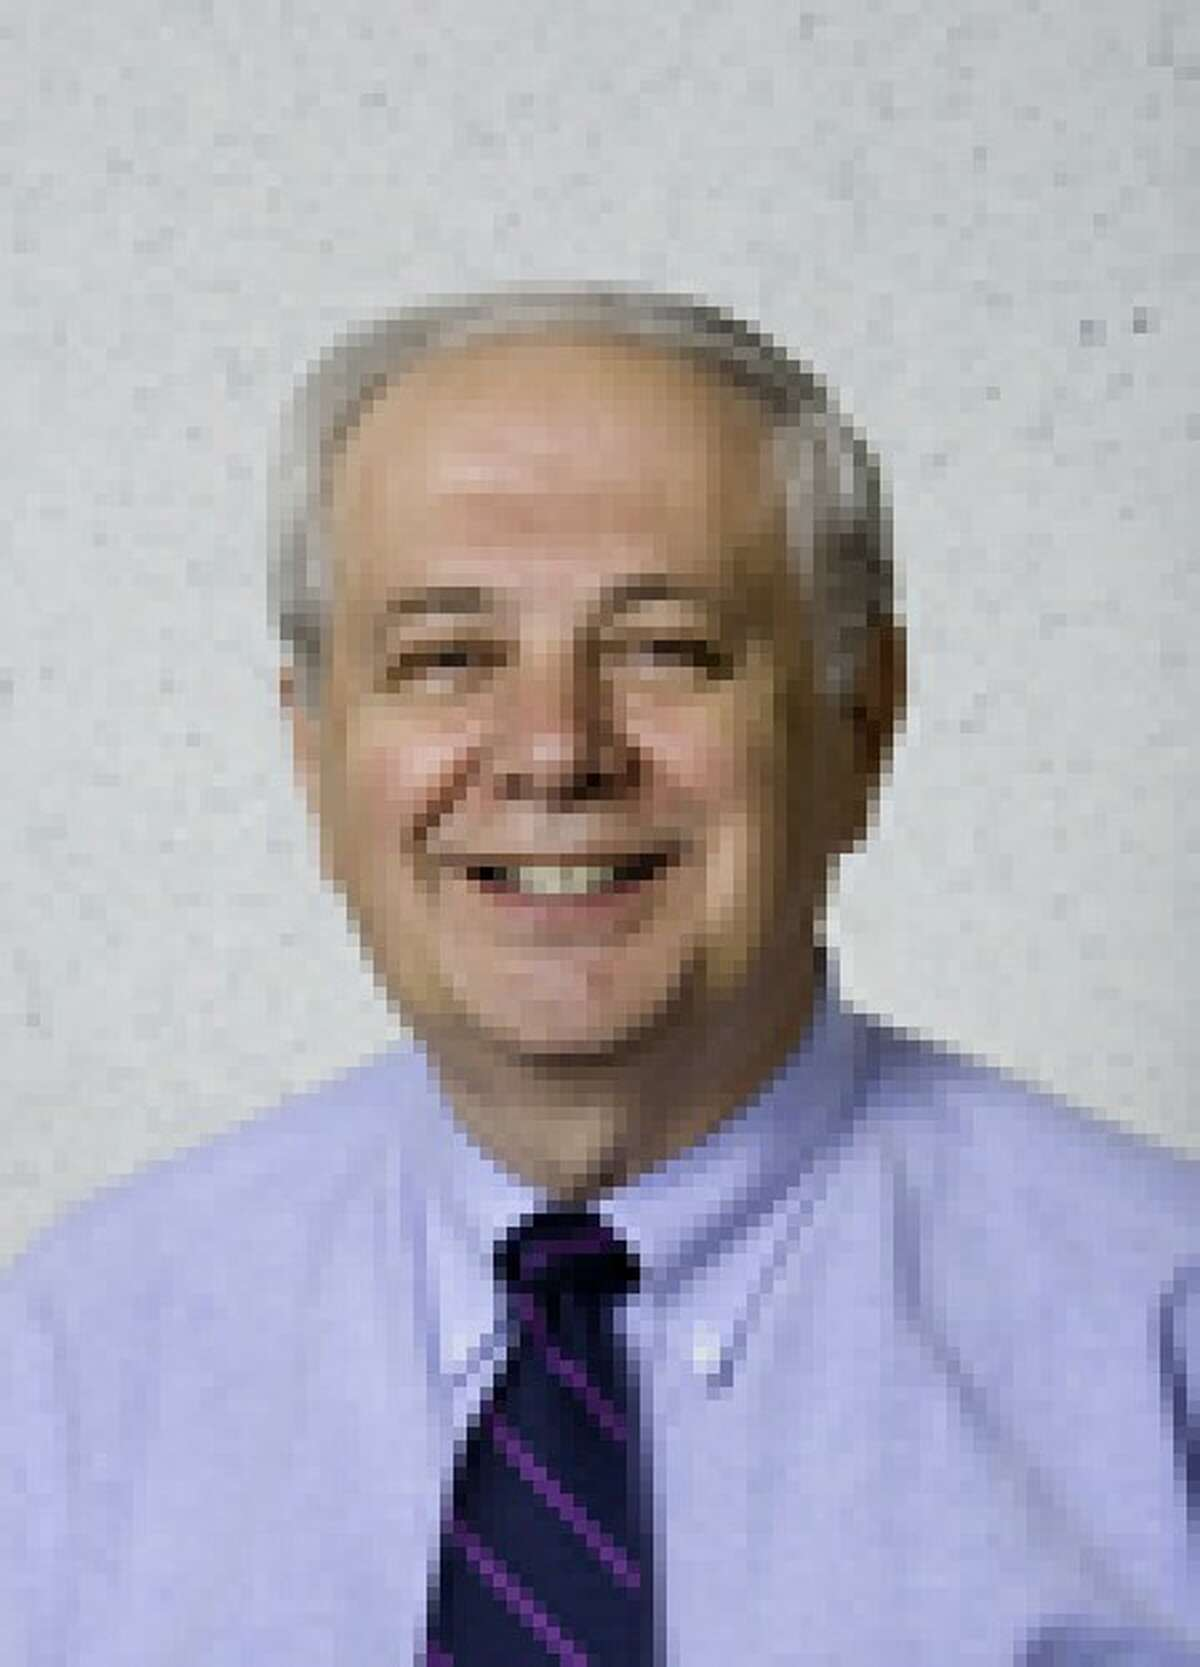 BOE approves new interim schools chief